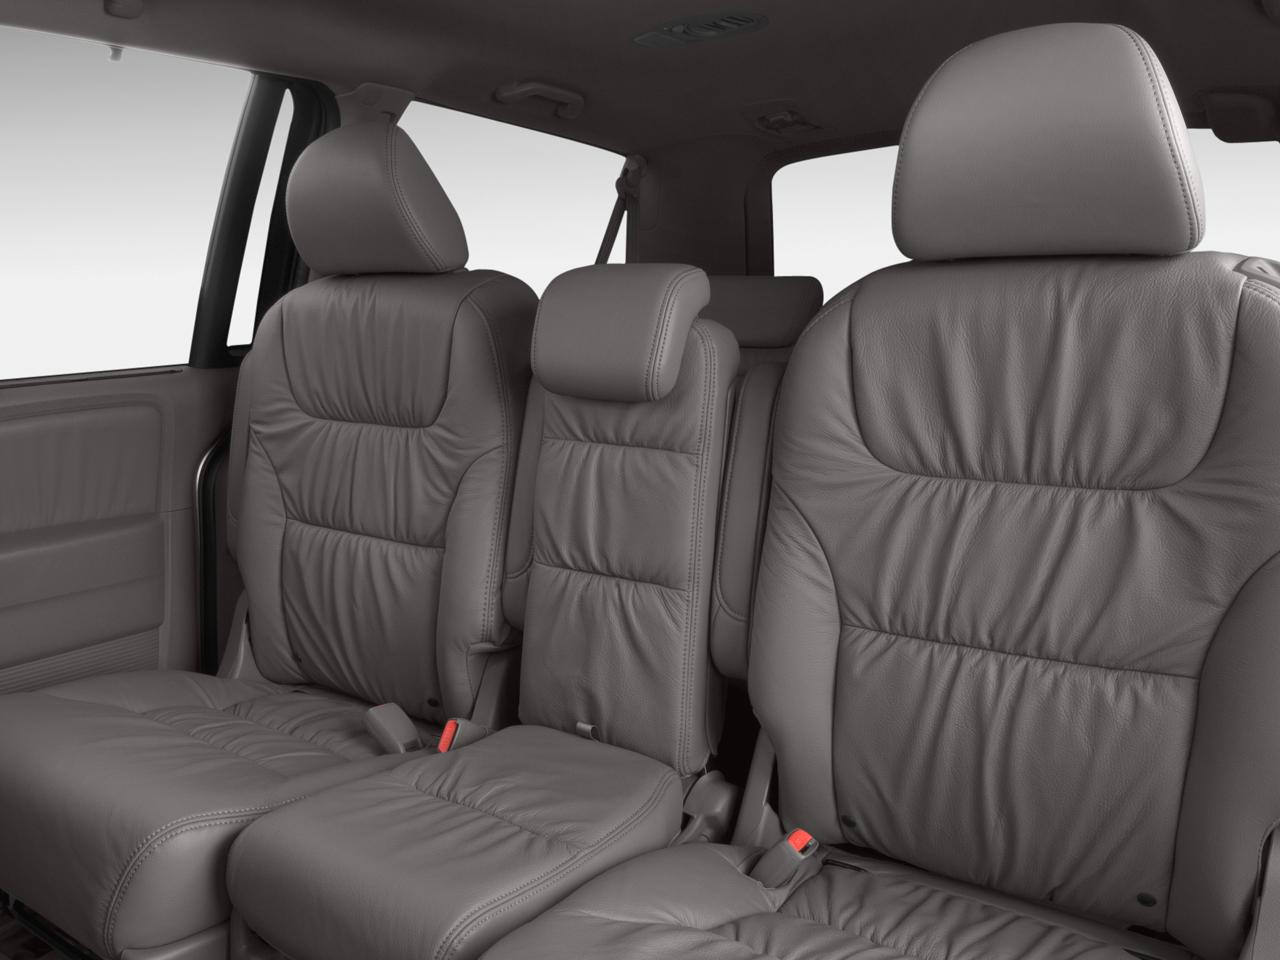 2009 honda odyssey touring honda minivan review for Honda odyssey seating